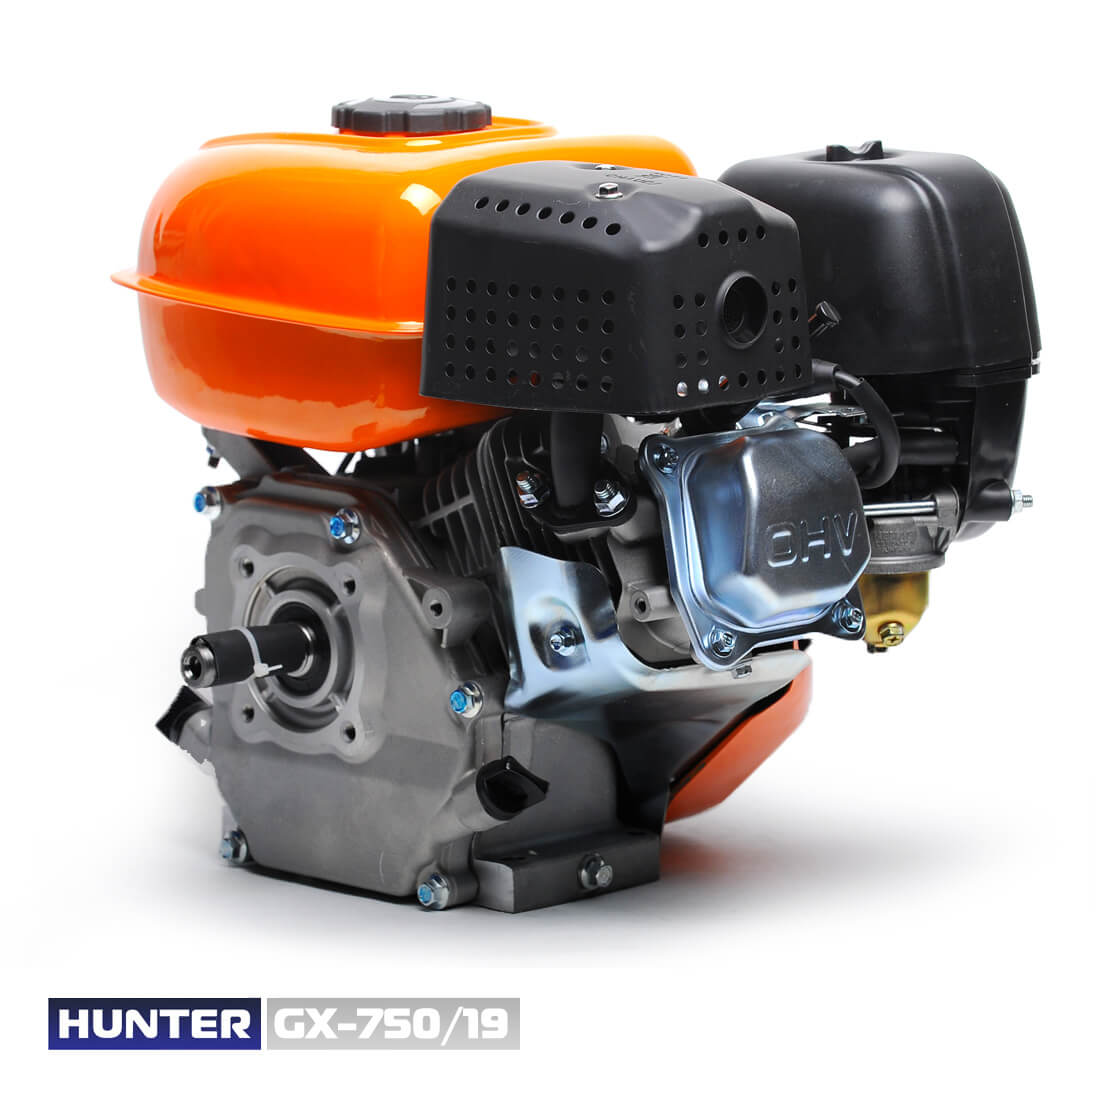 Фото GX-750/19 цена 4250грн №3 — Hunter